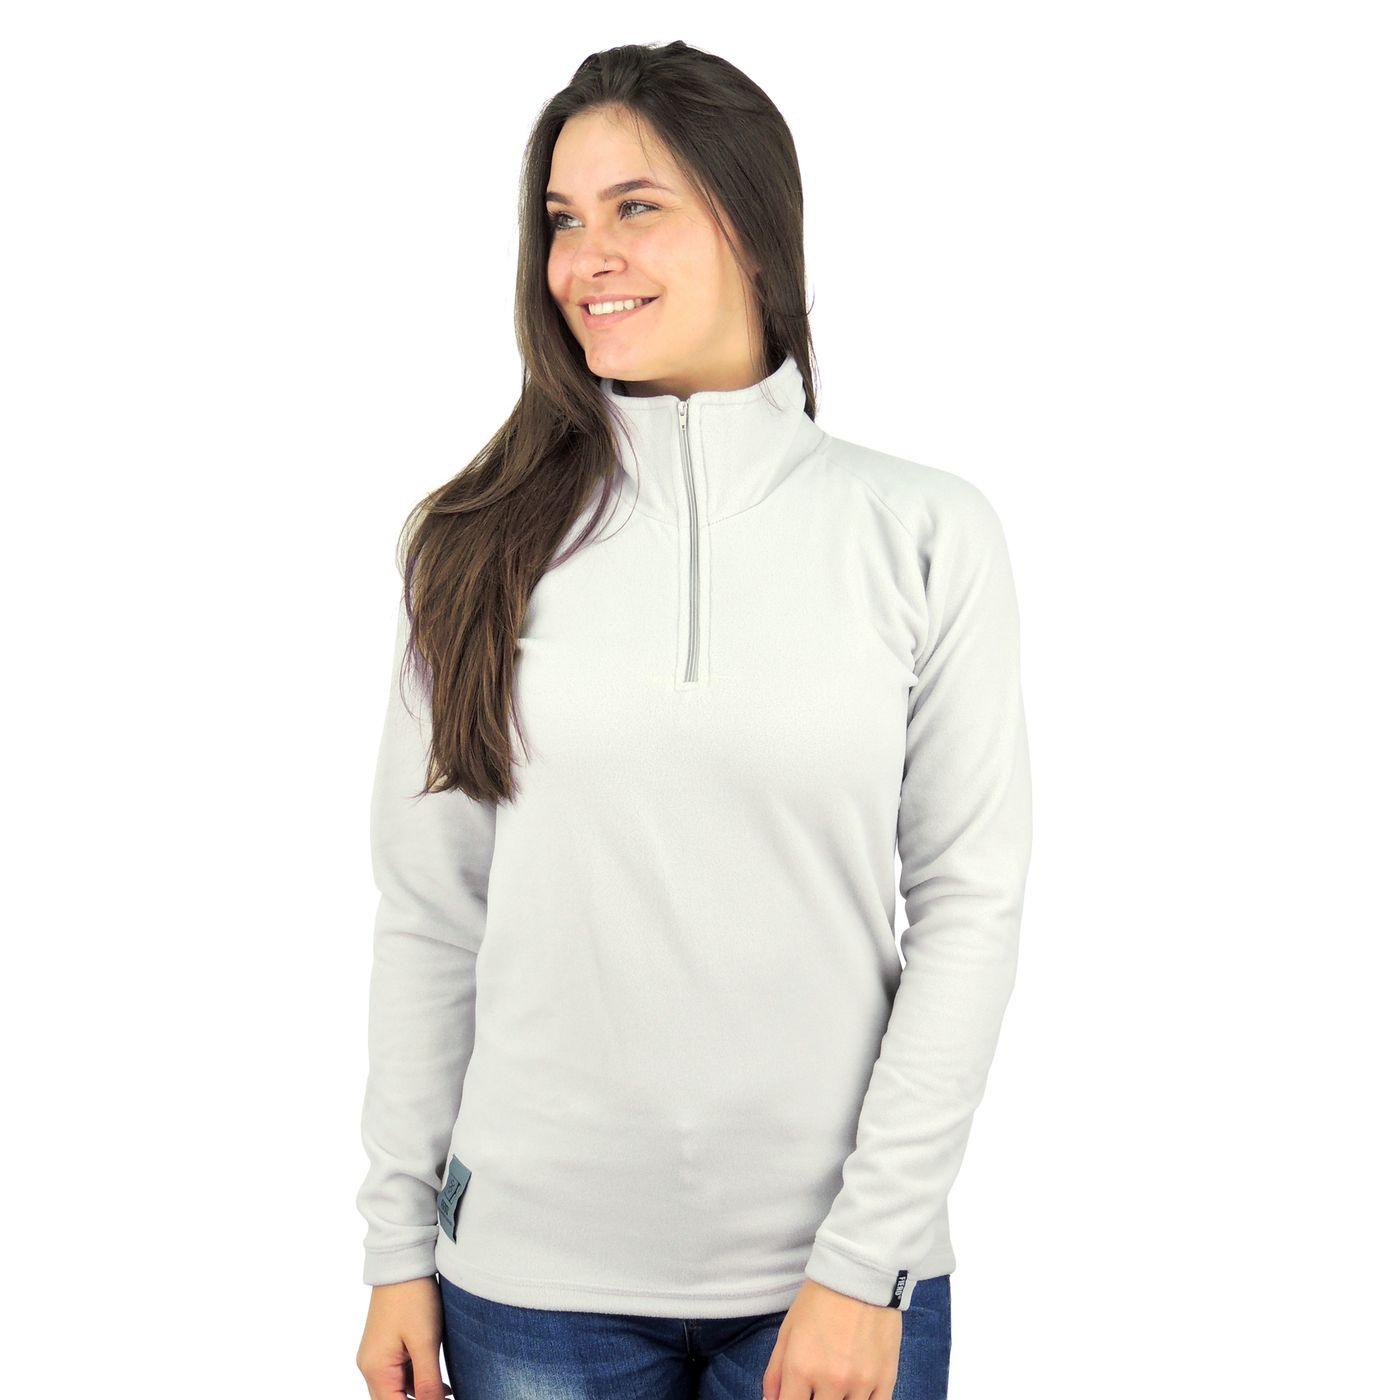 Fleece térmico feminino para o frio e inverno - fieroshop dac30fe60b0